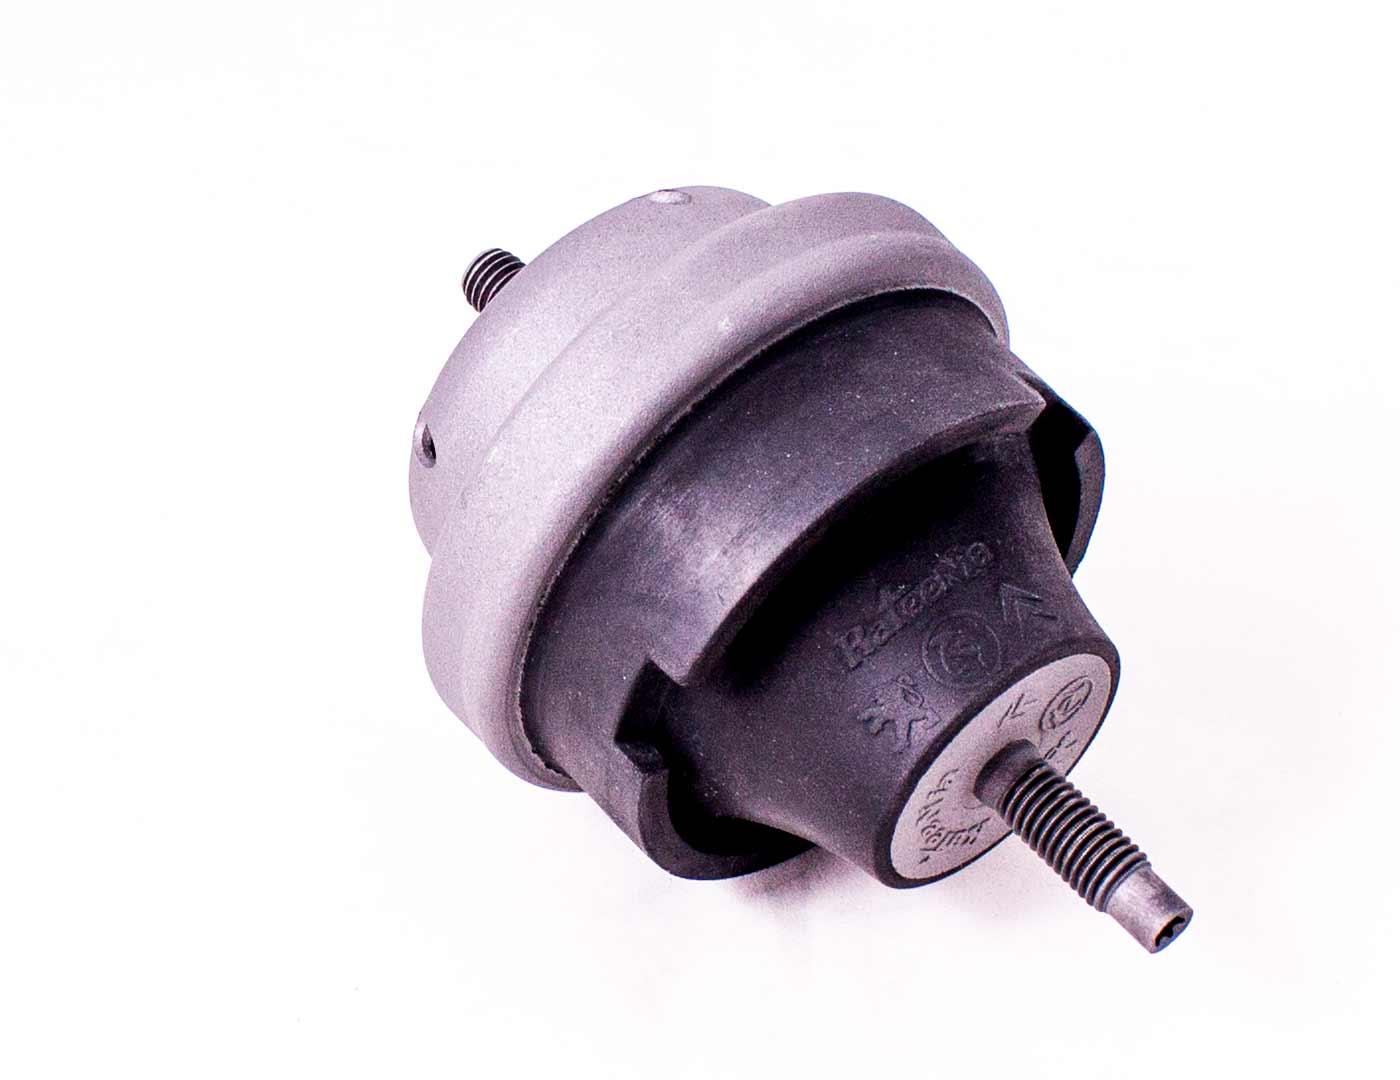 دسته موتور دو سر پیچ 405 (روغنی)